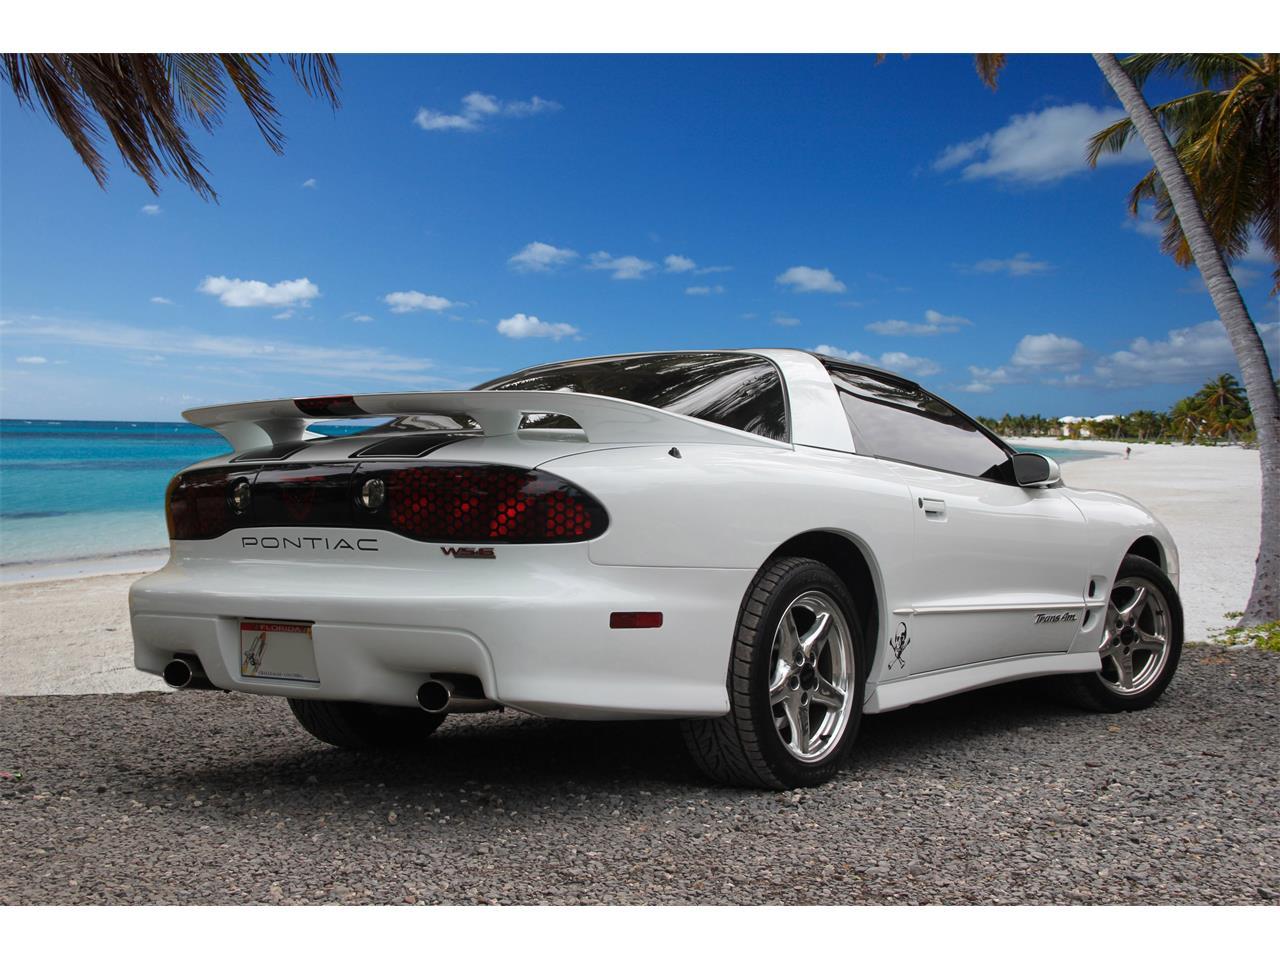 2002 Pontiac Firebird Trans Am WS6 (CC-1252822) for sale in Coral Springs, Florida